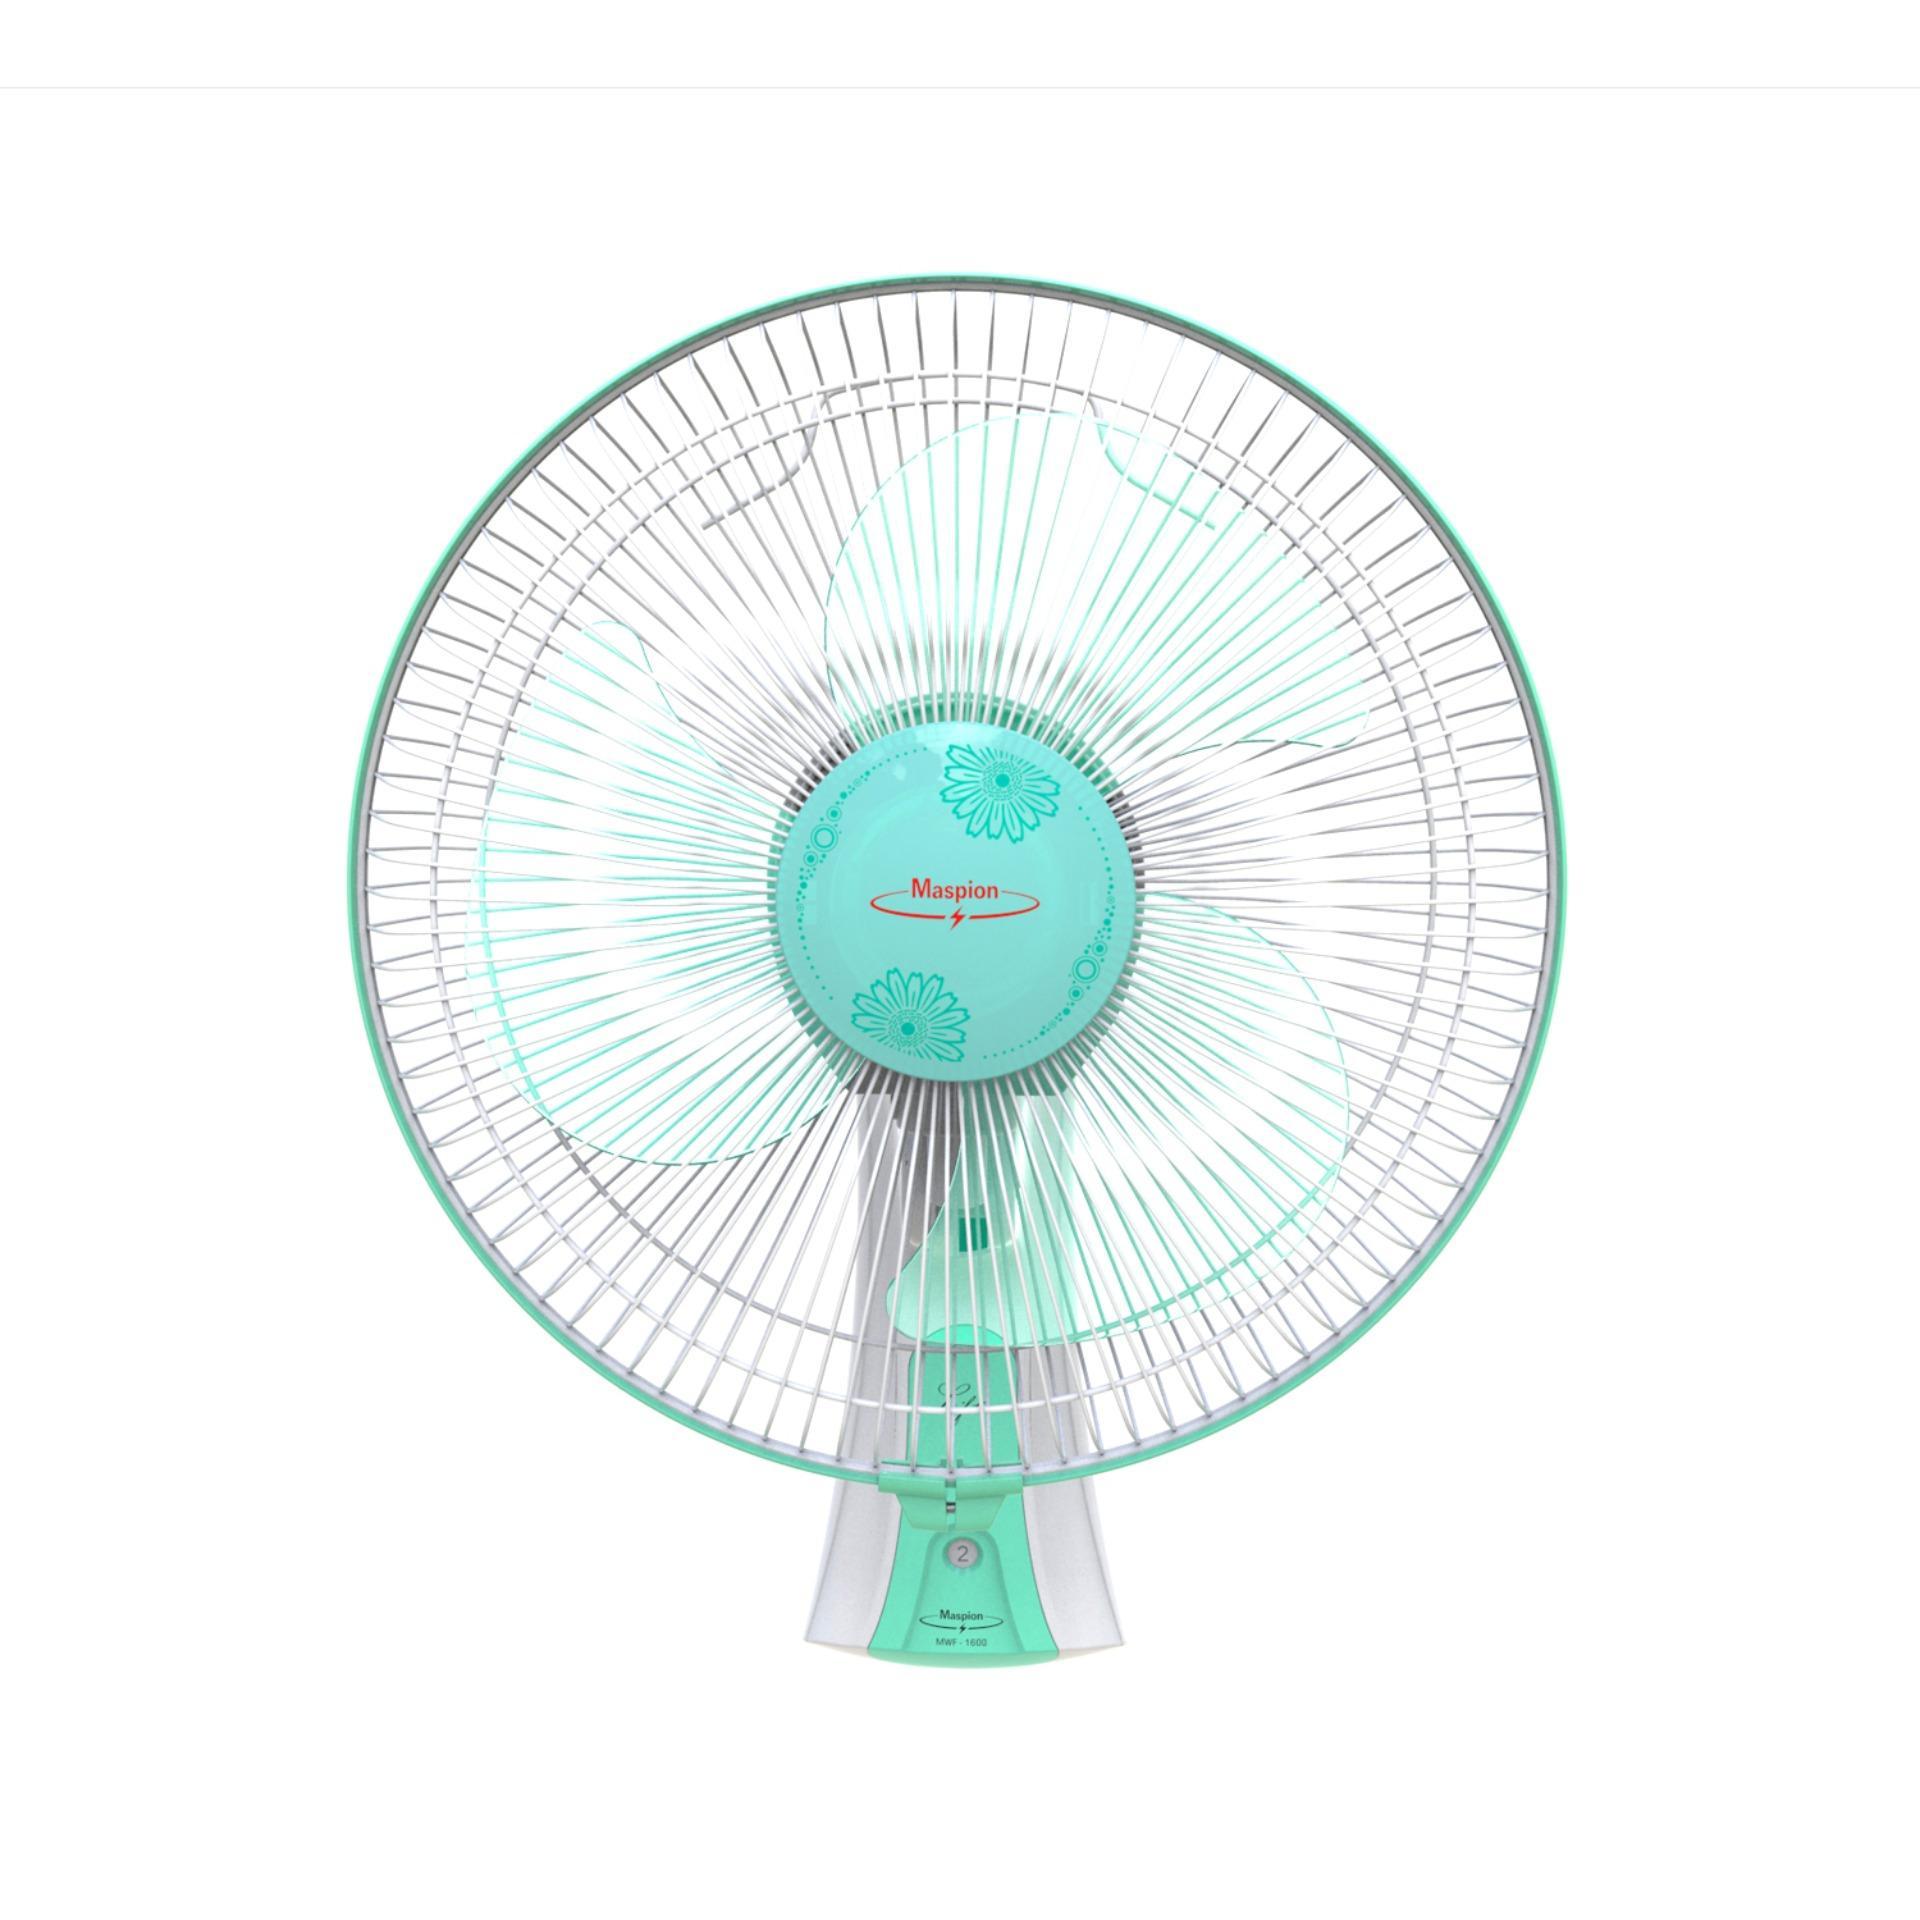 Maspion MWF-1200 Wall Fan / Kipas Angin Dinding 12 Inch / 30 cm